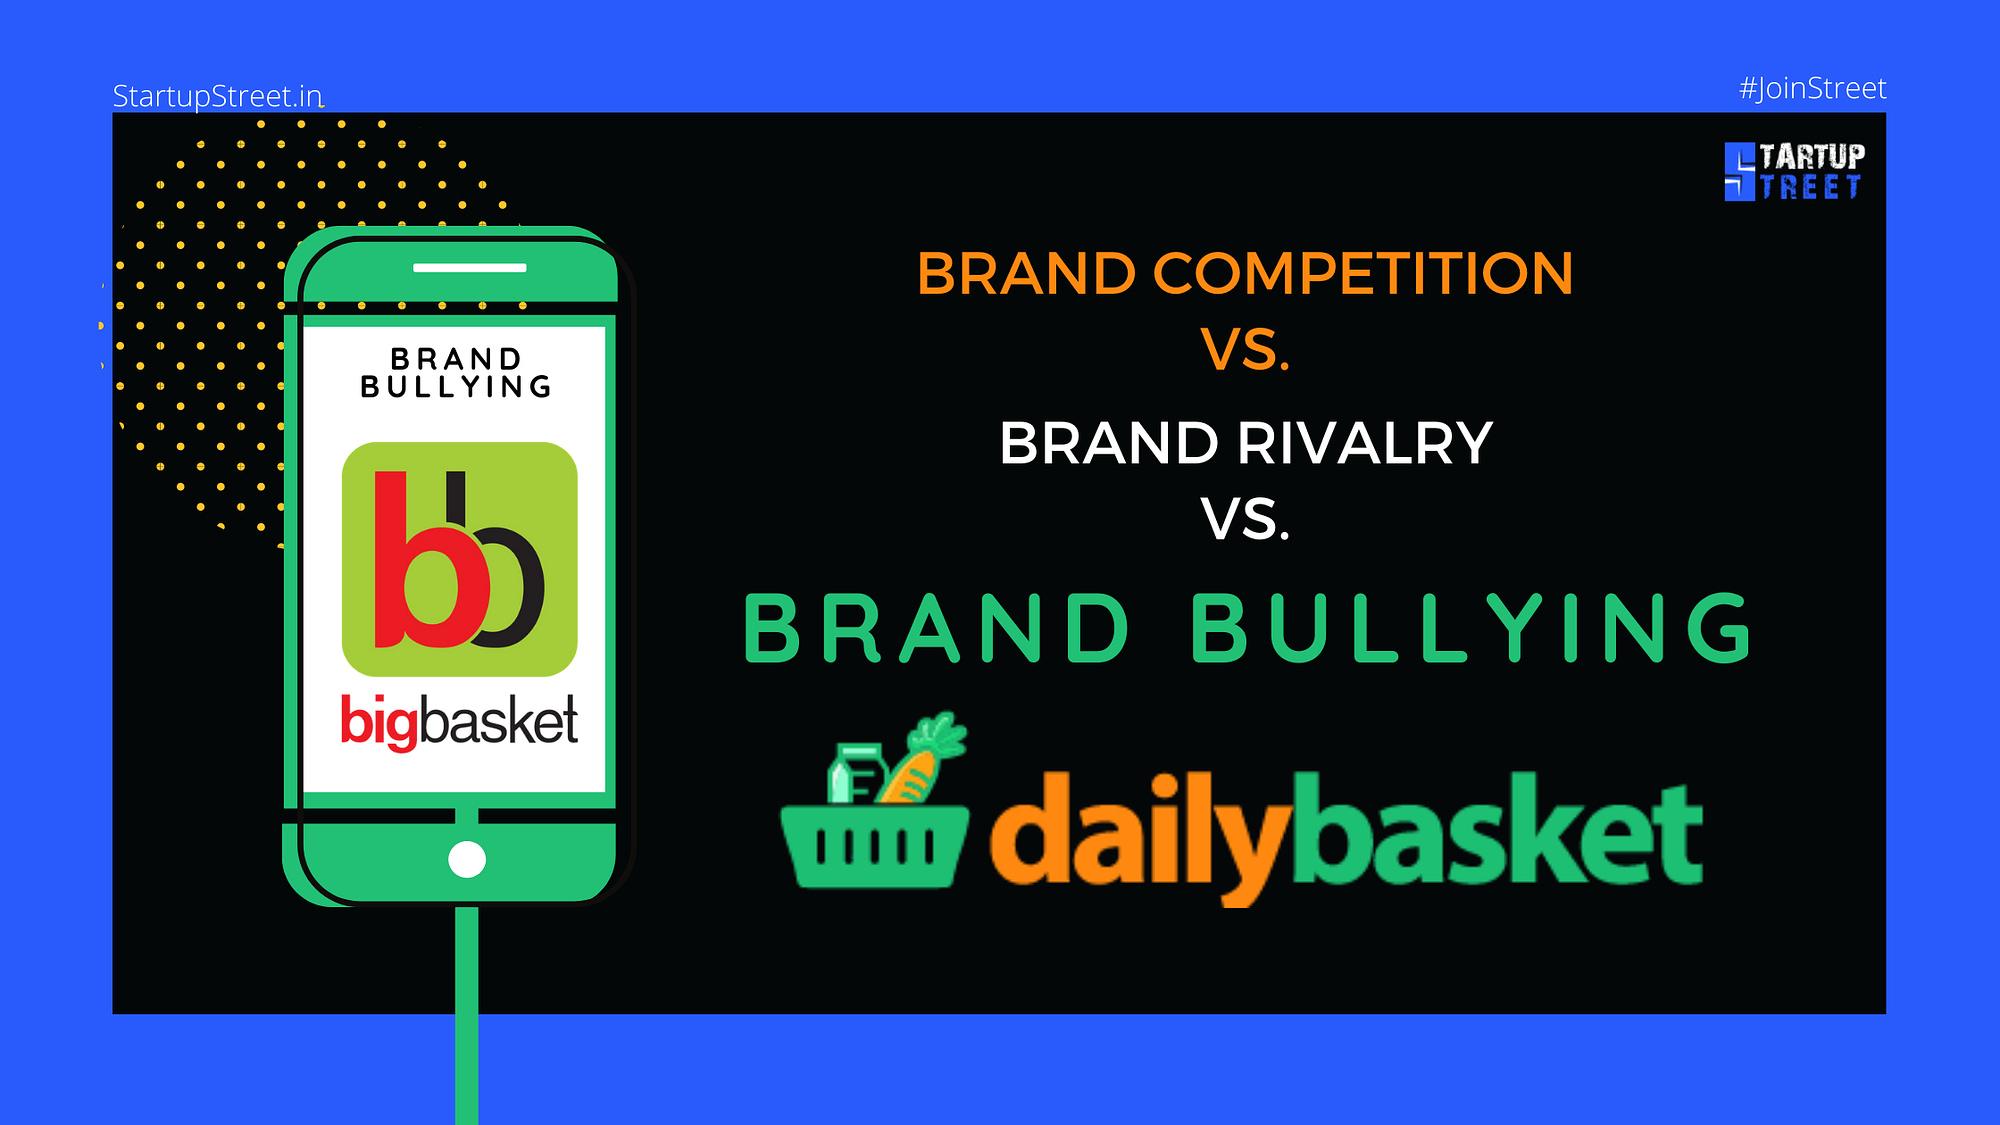 Brand Competition vs brand rivalry vs brand bullying-StartupStreet Blogs